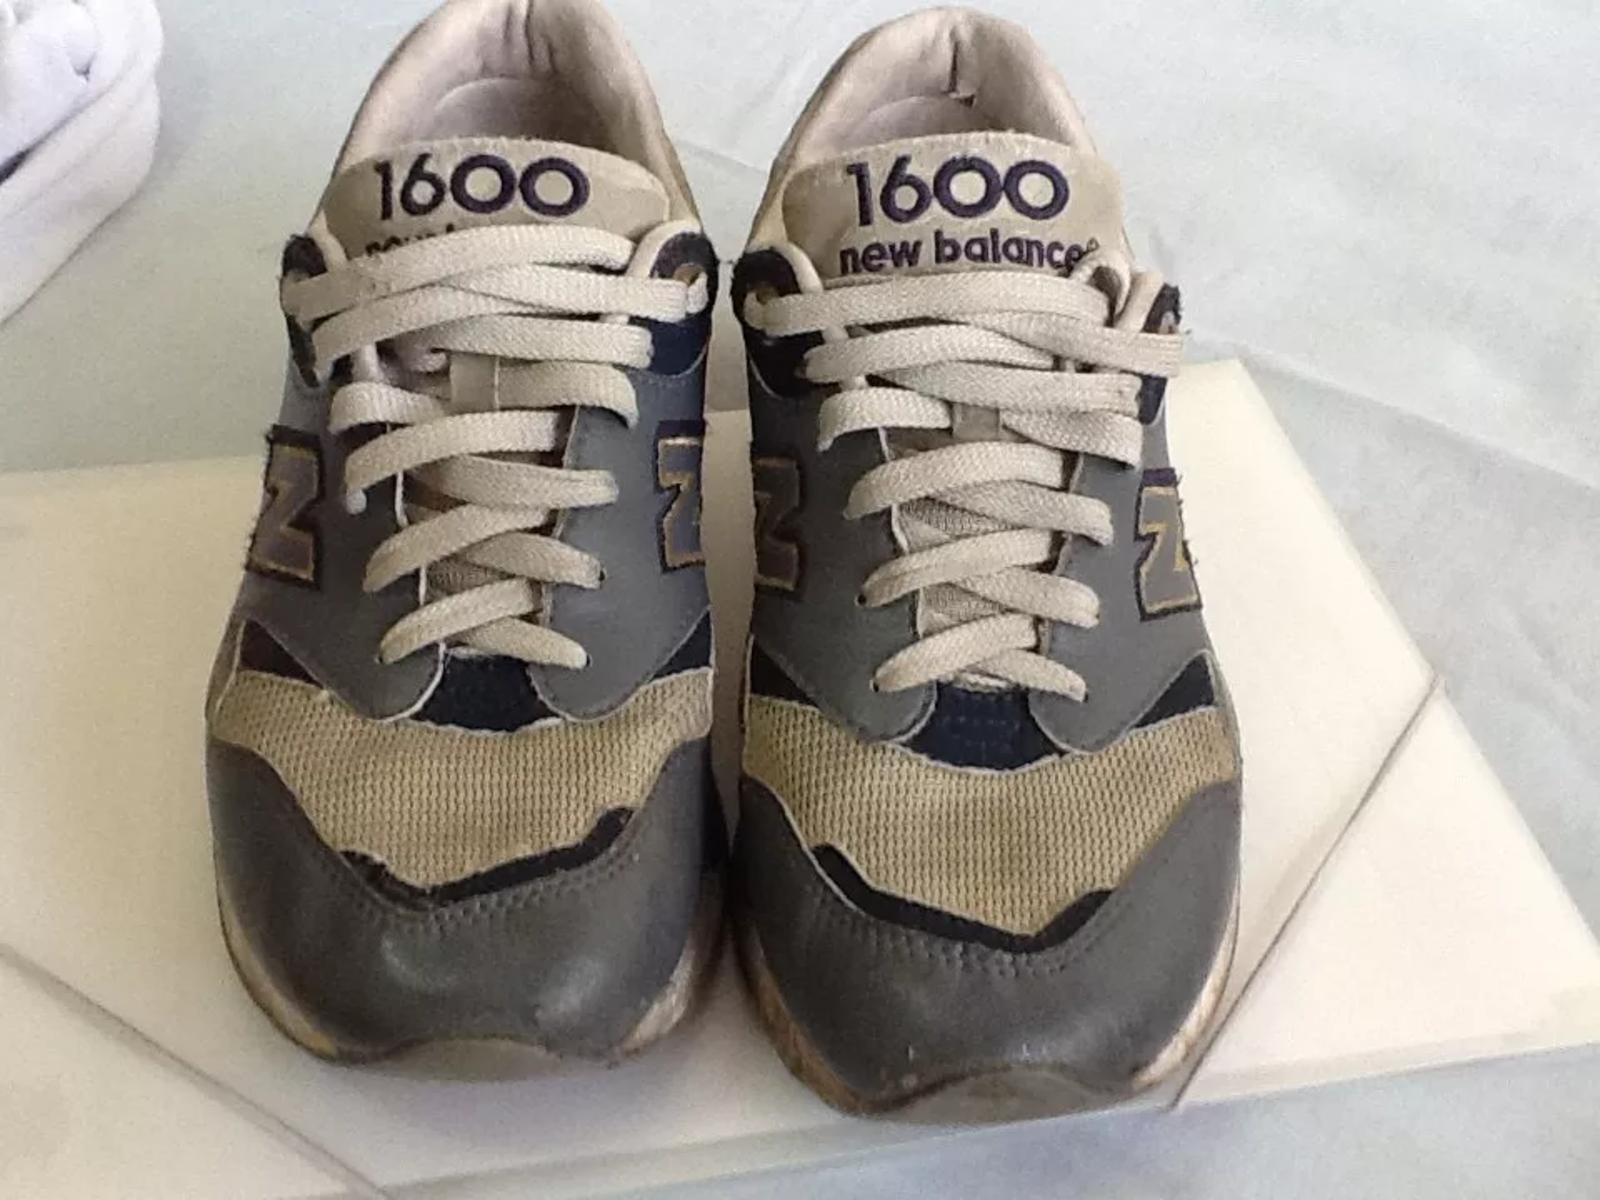 new balance 1600 anos 90